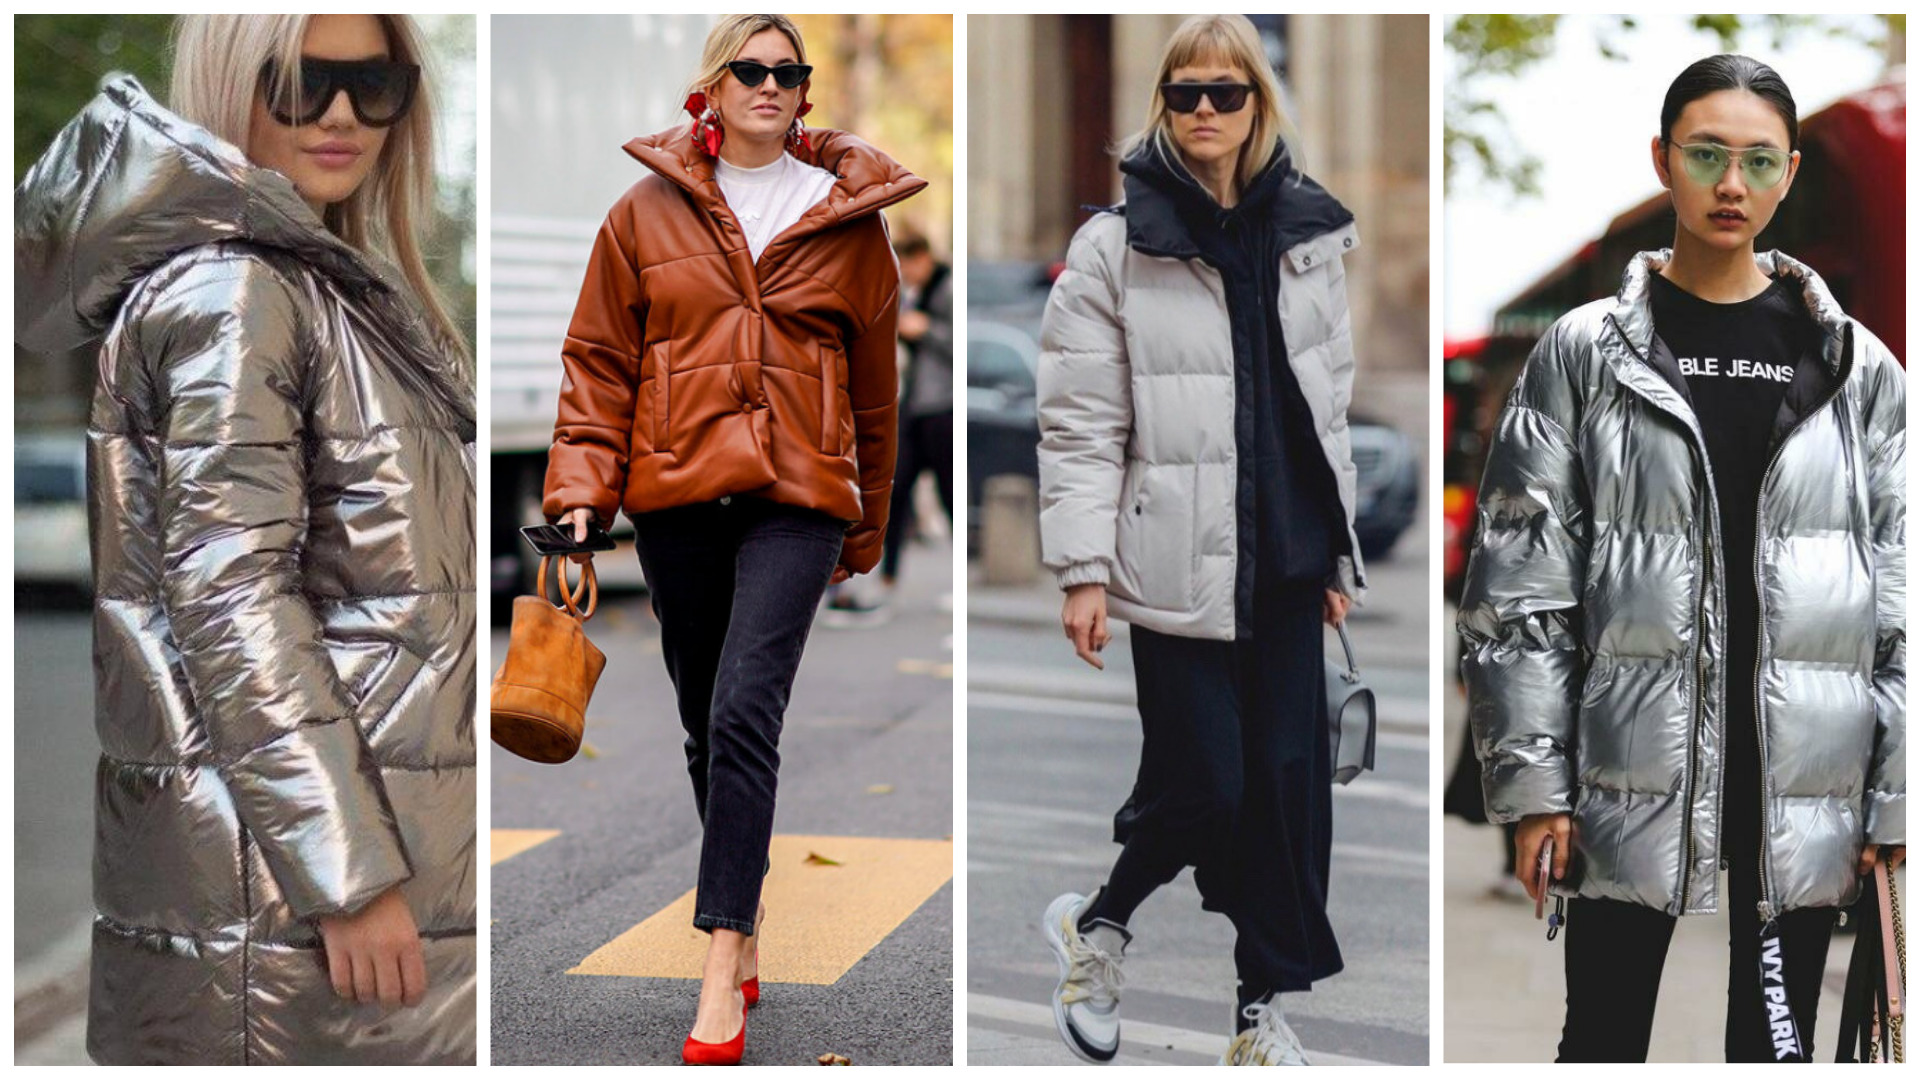 короткая объемная куртка, мода осени 2020, тренды осени